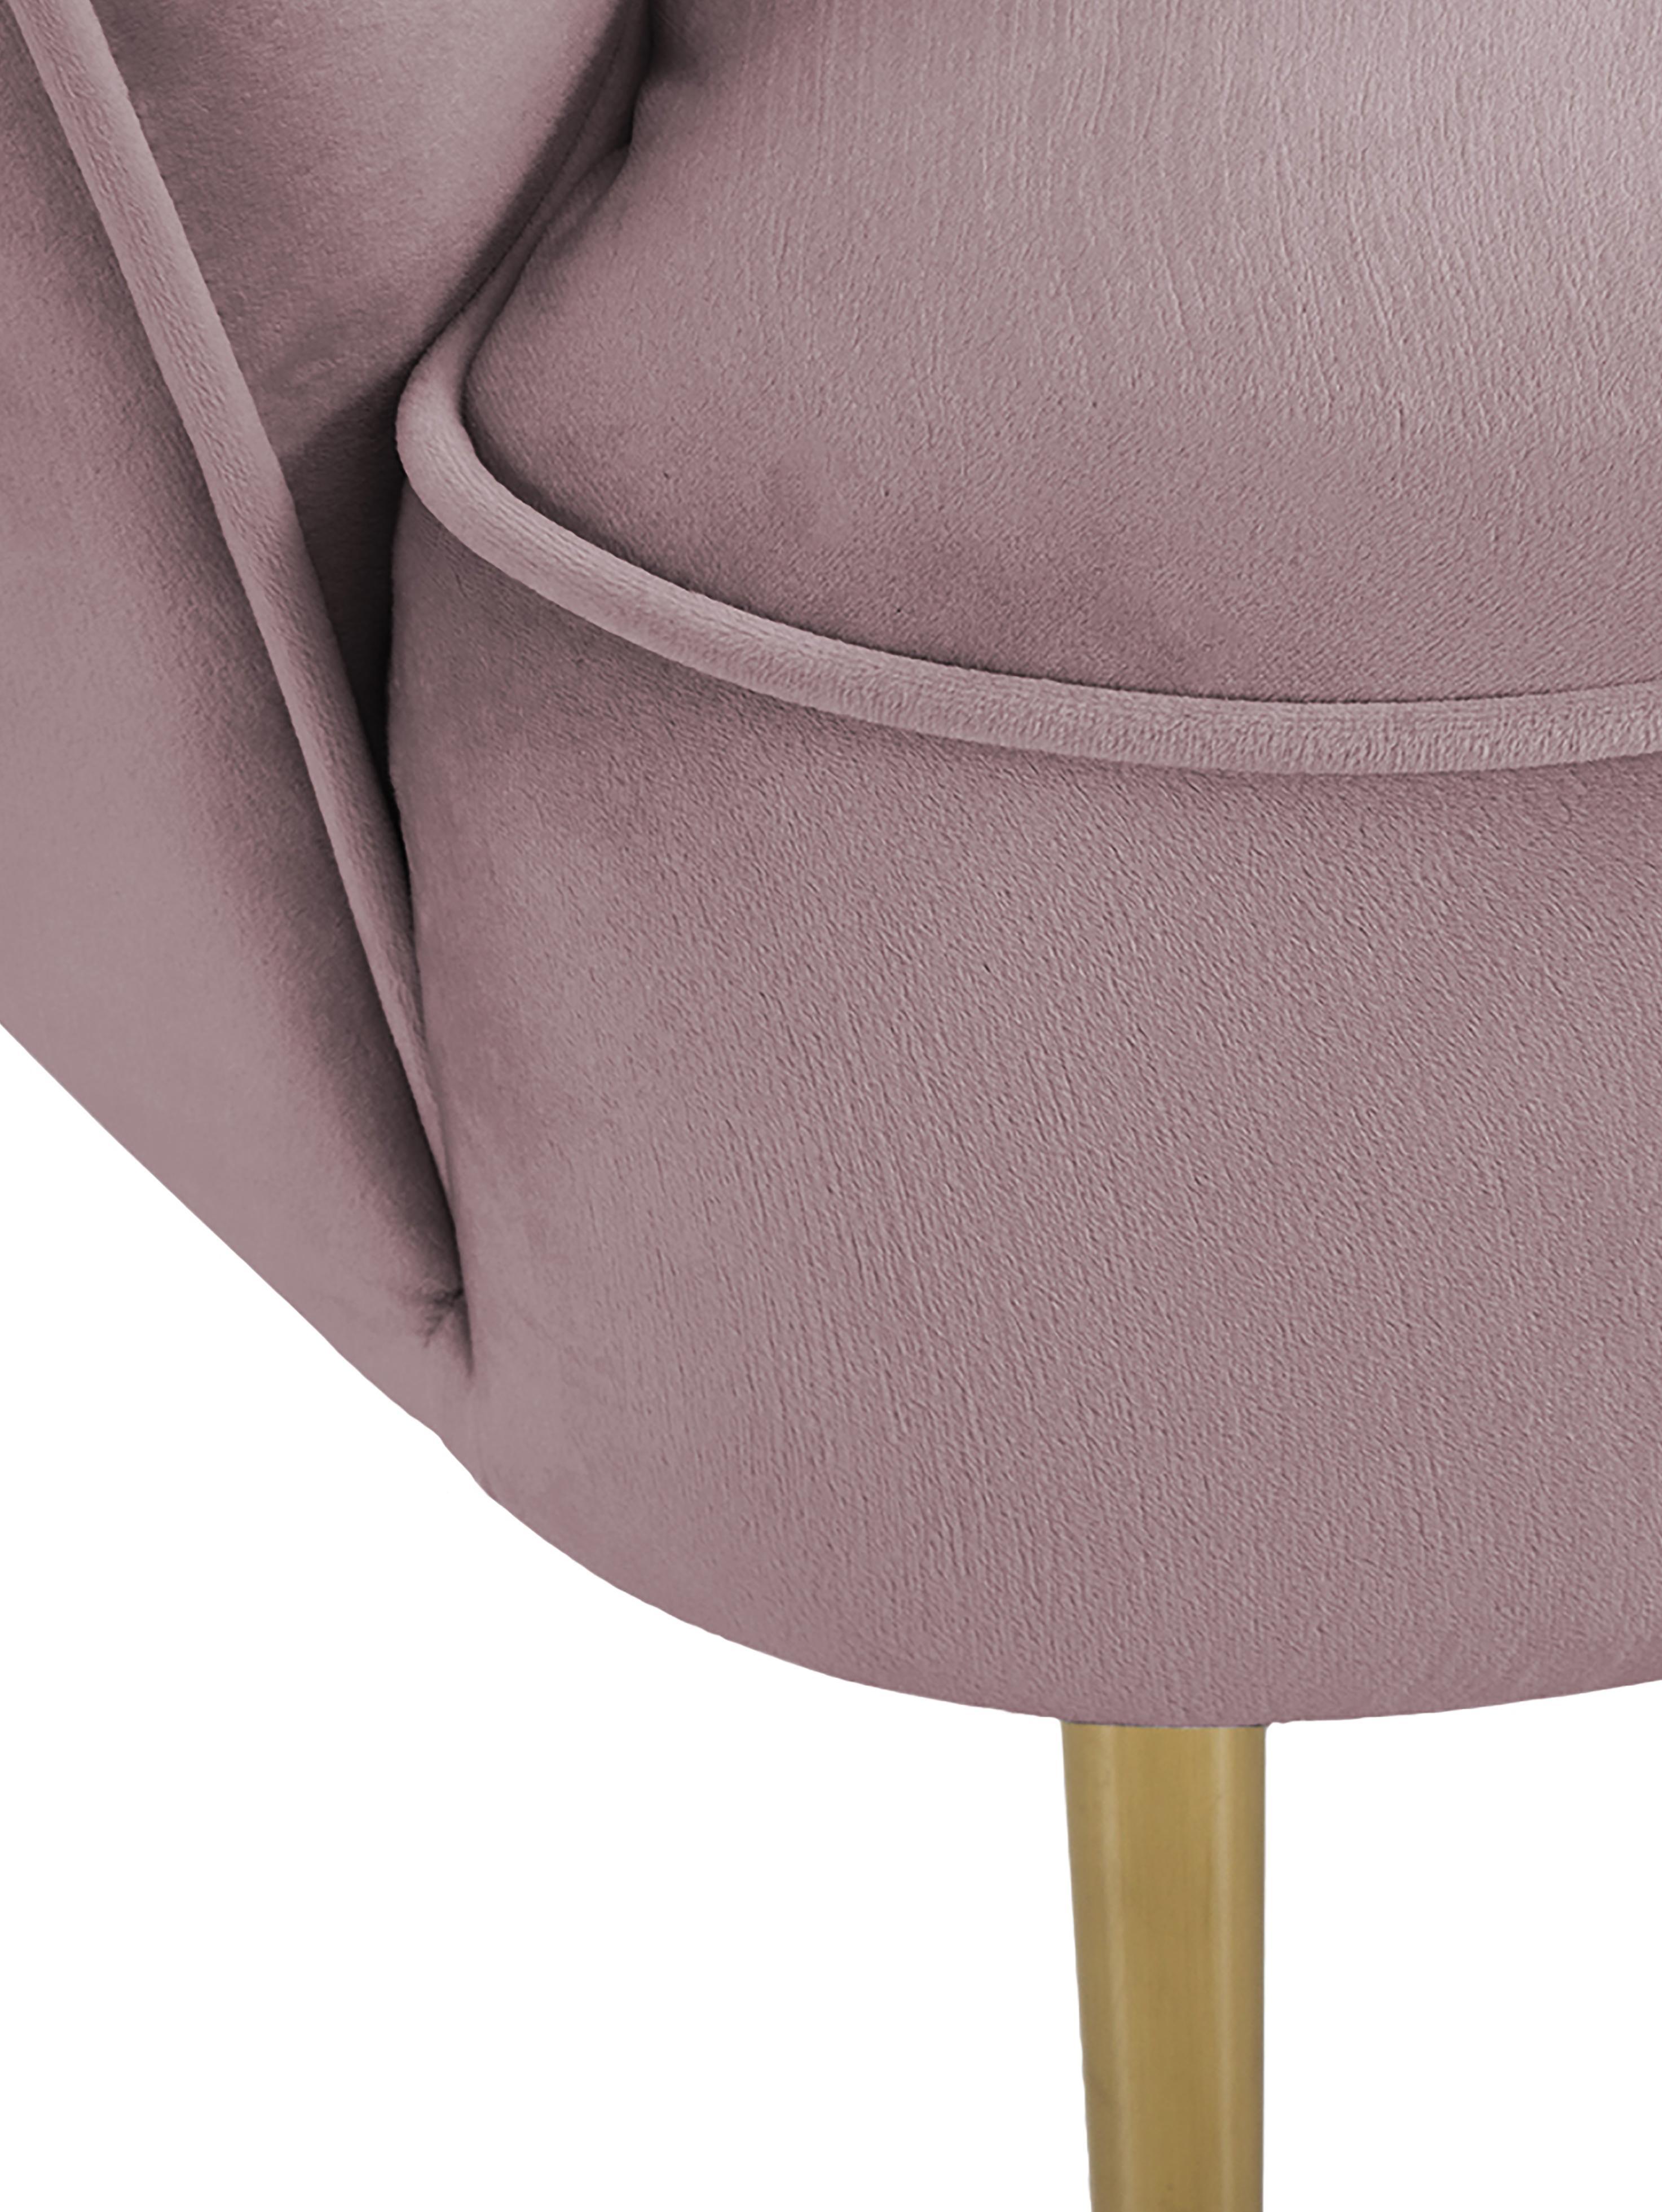 Samt-Cocktailsessel Louise in Rosa, Bezug: Samt (Polyester) Der hoch, Füße: Metall, beschichtet, Samt Mauve, B 76 x T 74 cm